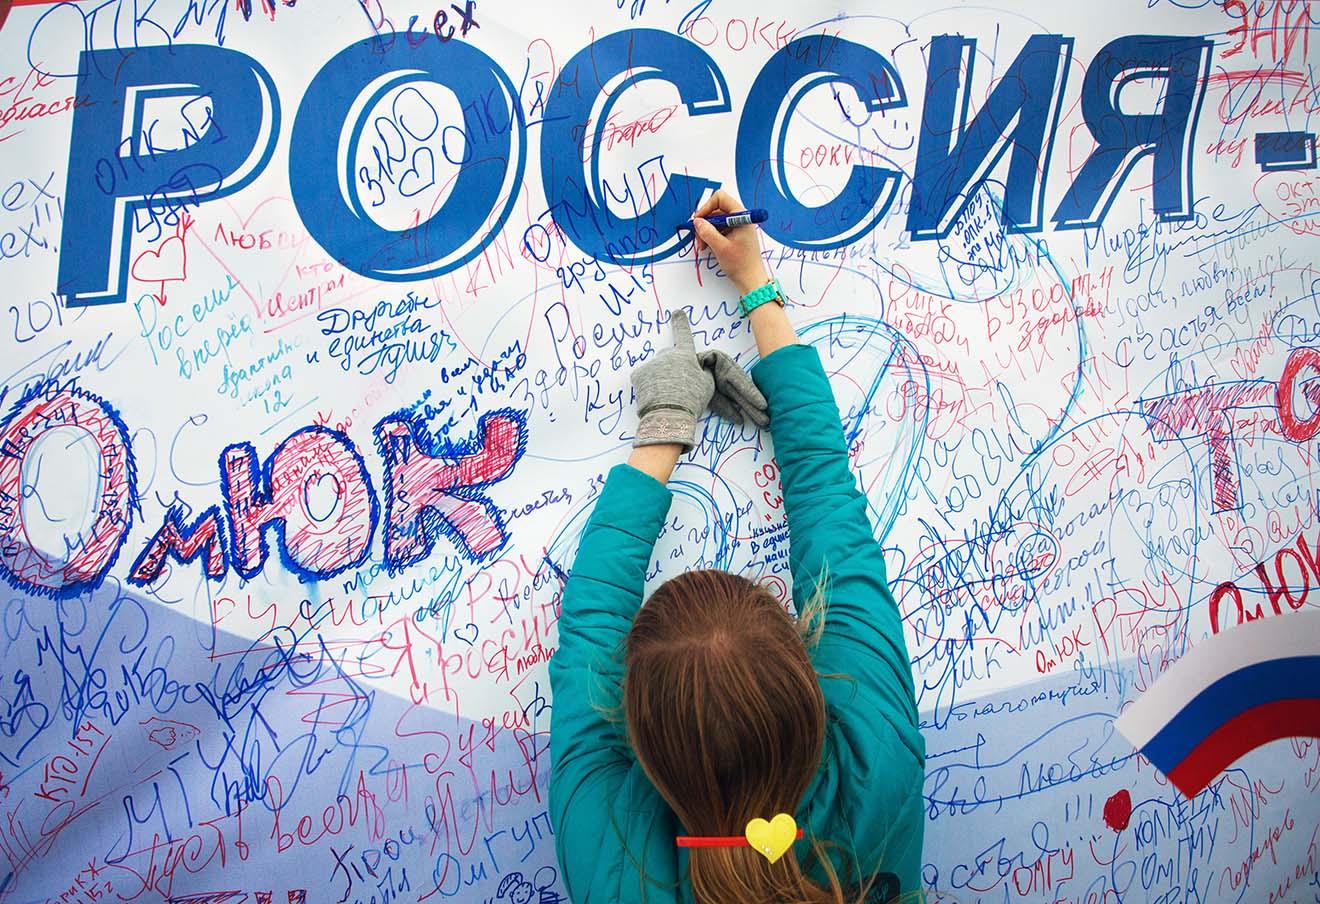 Во время празднования Дня народного единства в Омске.